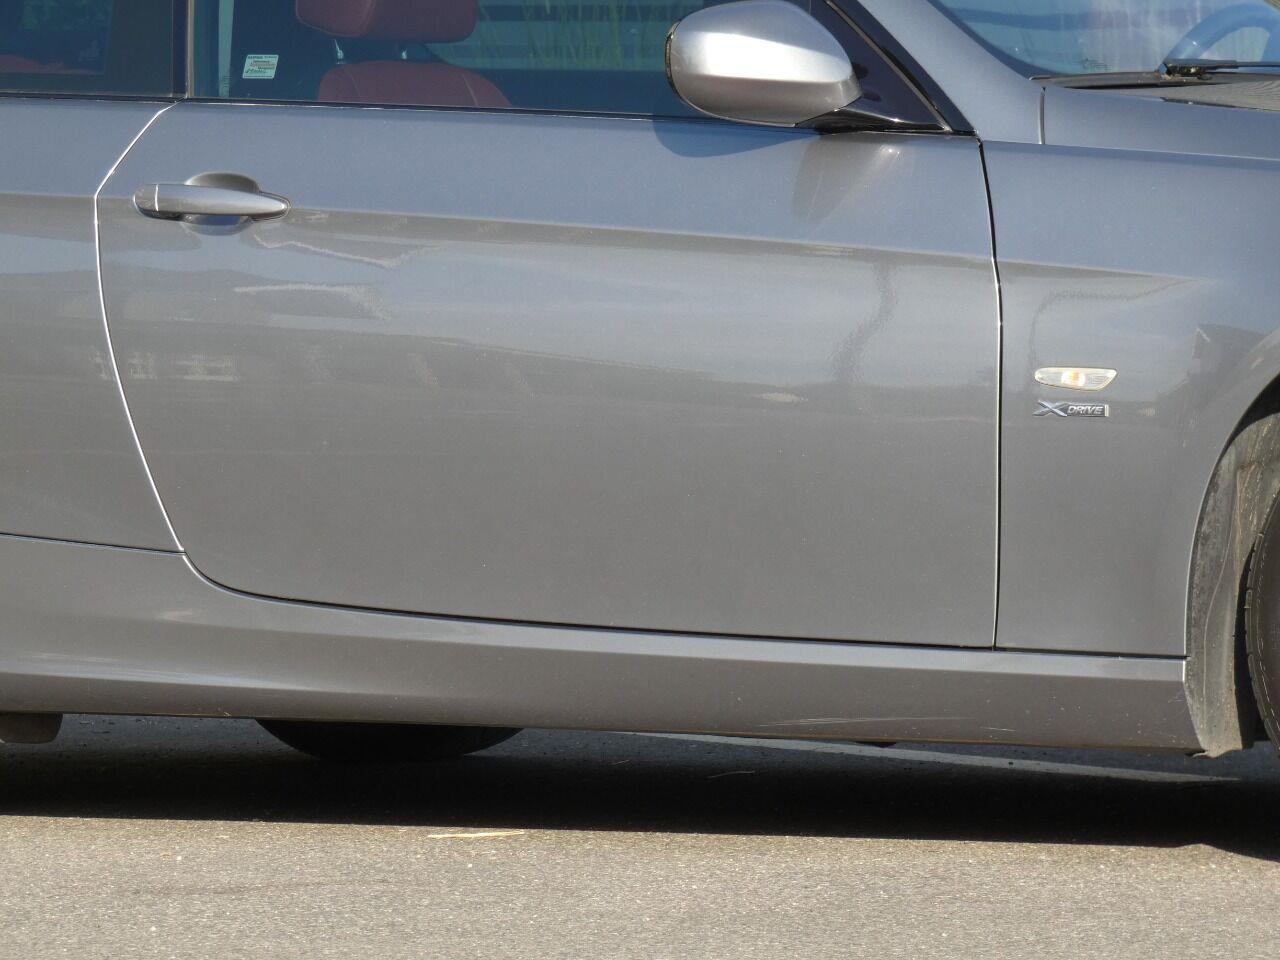 2011 BMW 3 Series (CC-1380108) for sale in Hailey, Idaho